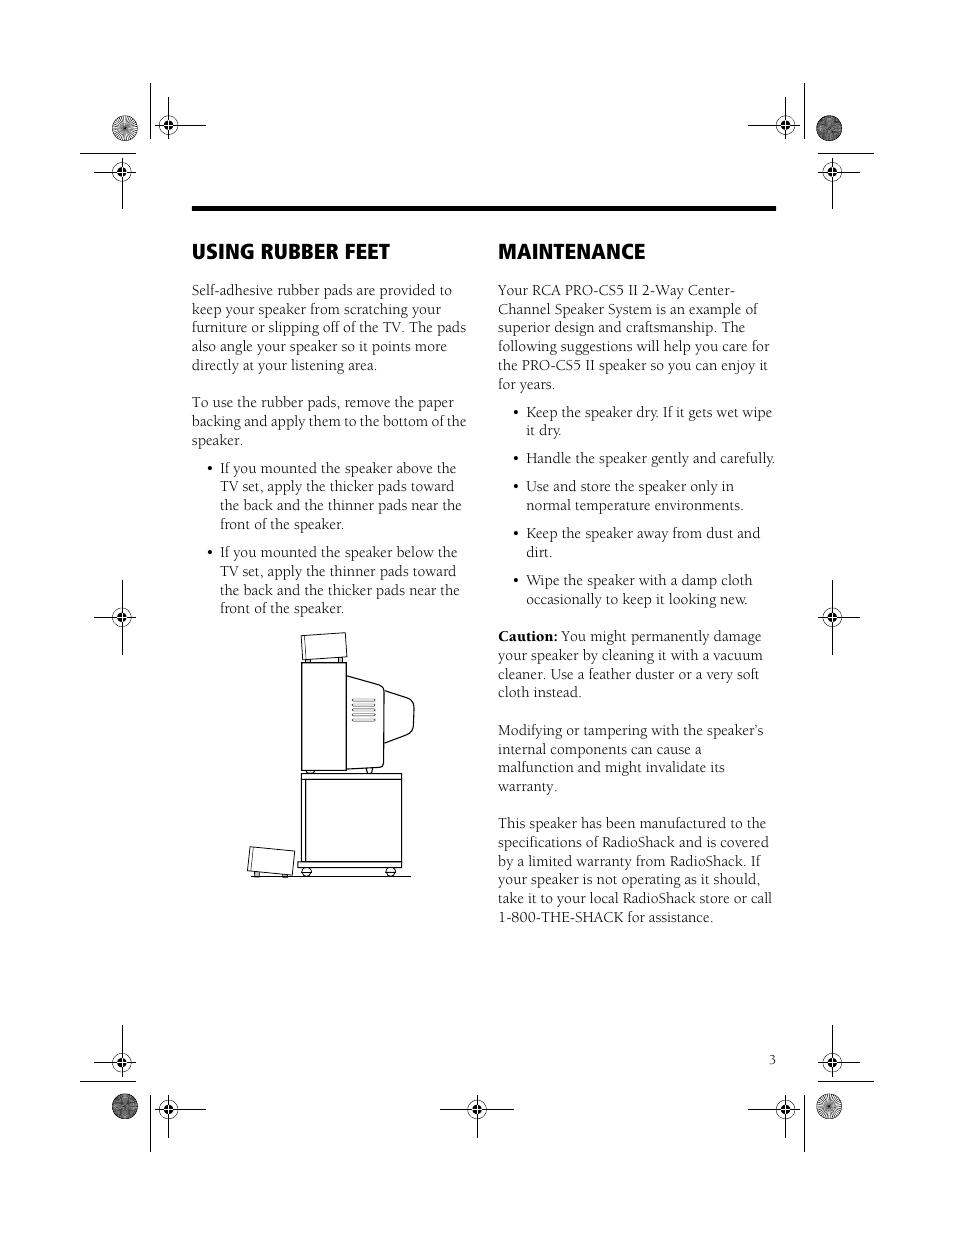 Using rubber feet, Maintenance | RCA PRO-CS5II User Manual | Page 3 / 4